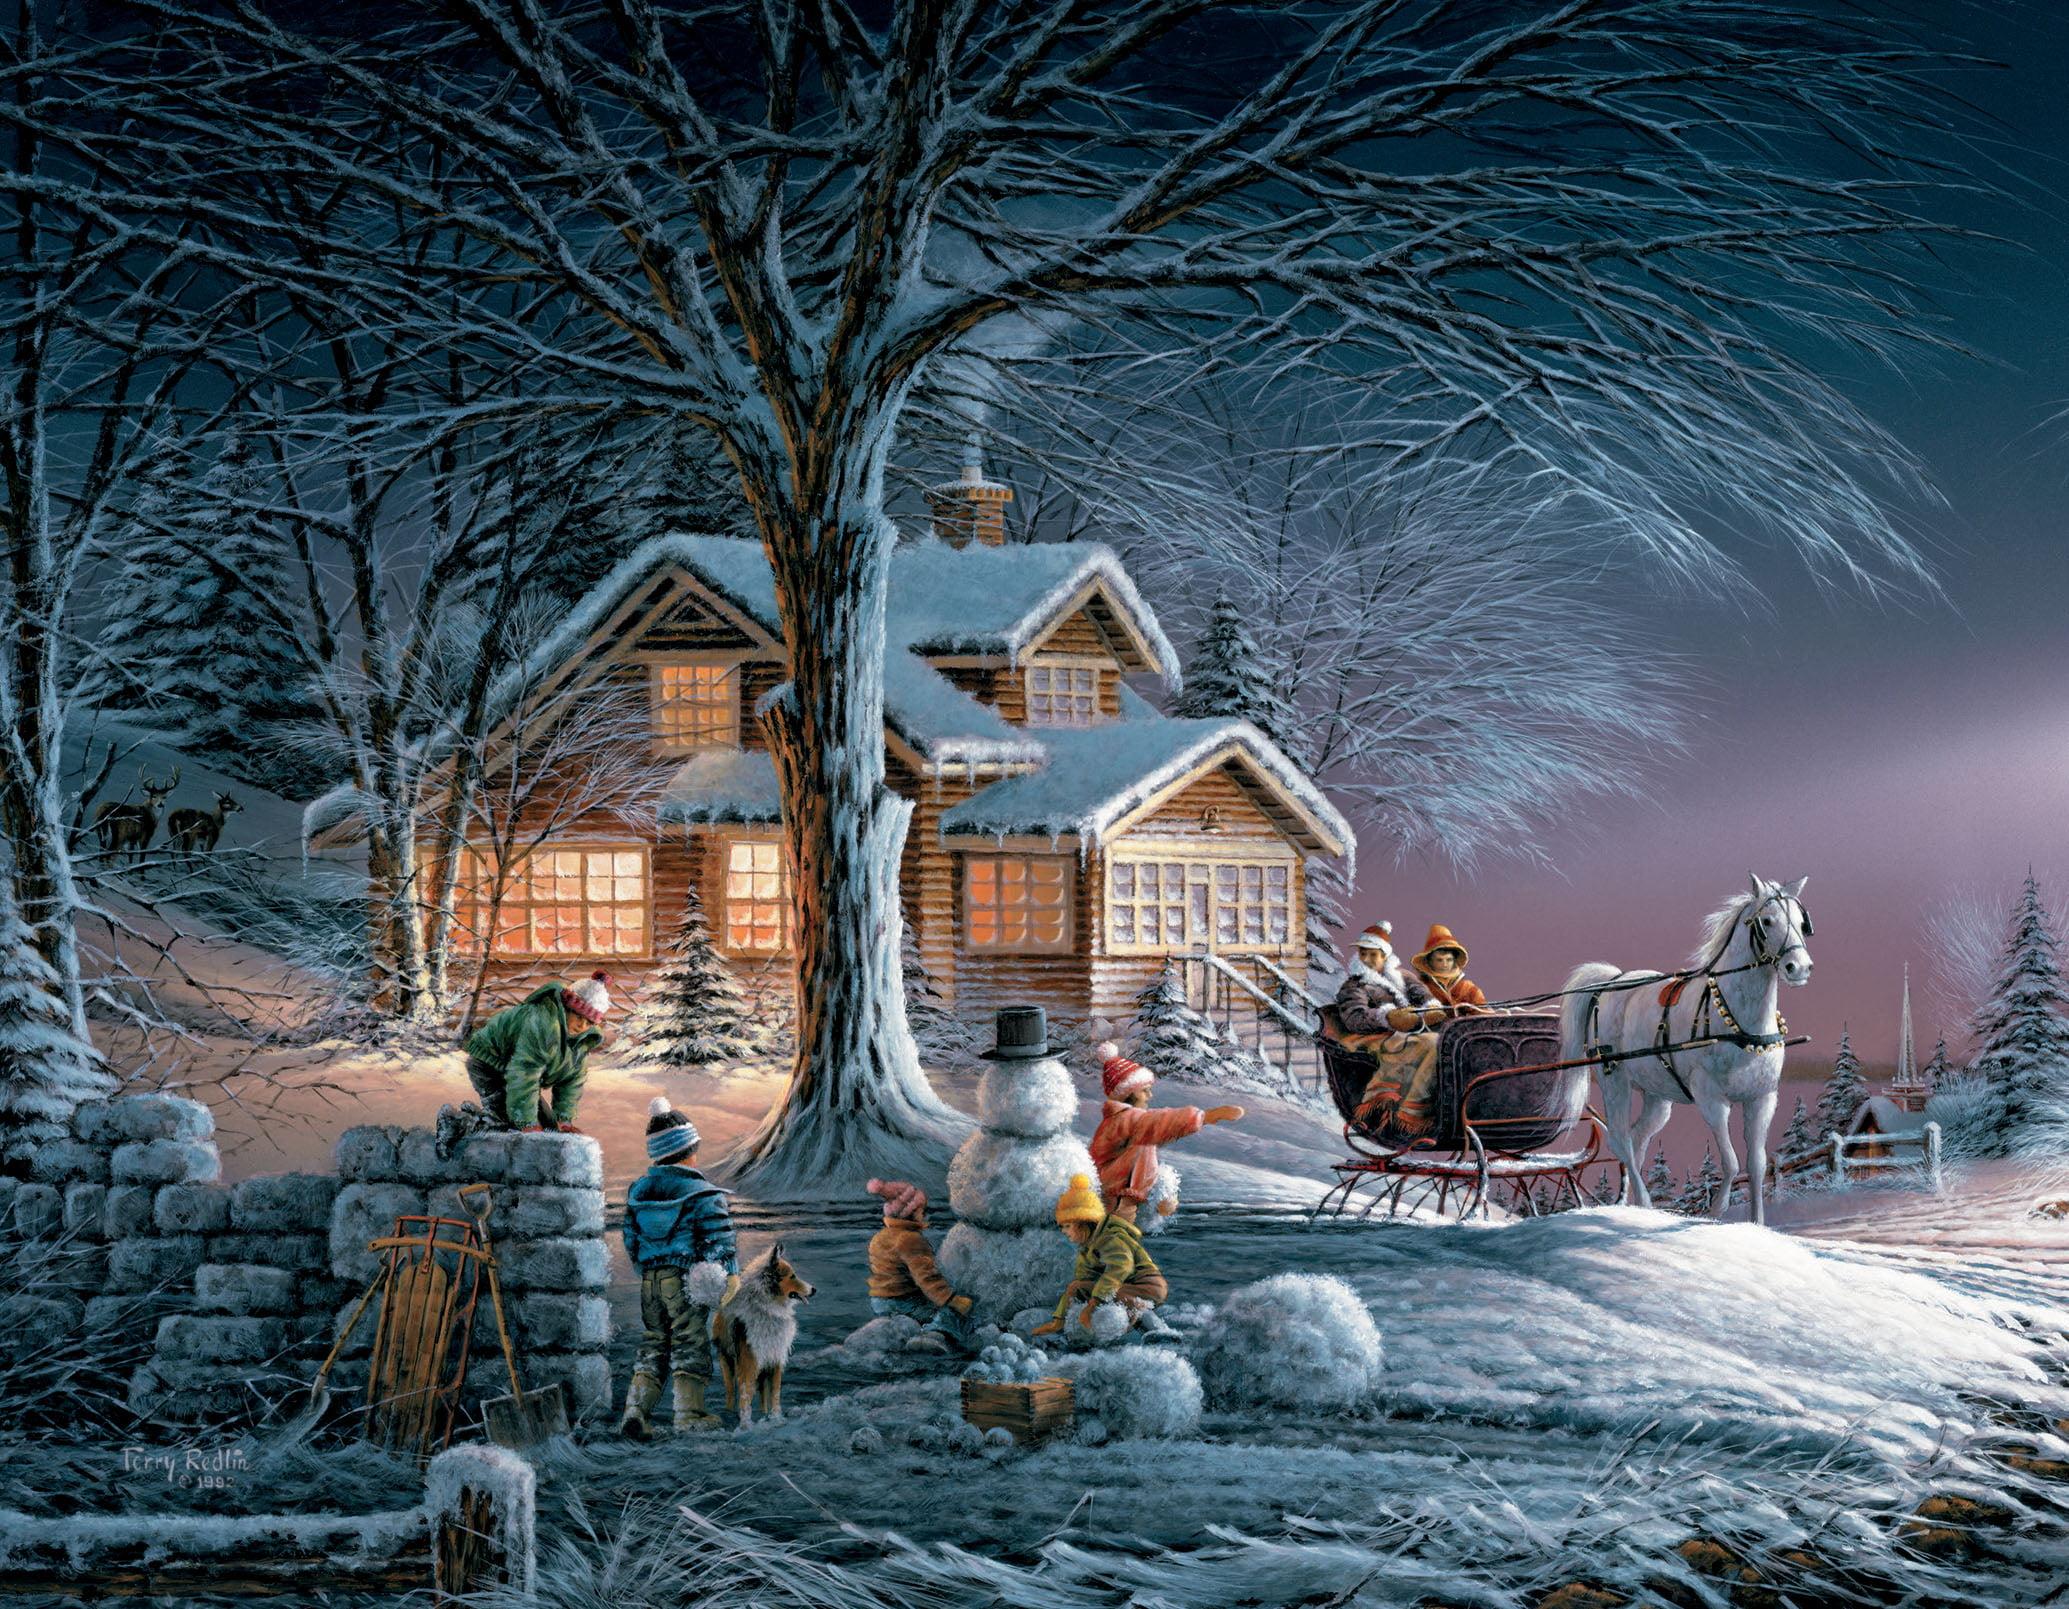 LANG WINTER WONDERLAND BOXED CHRISTMAS CARDS - Walmart.com